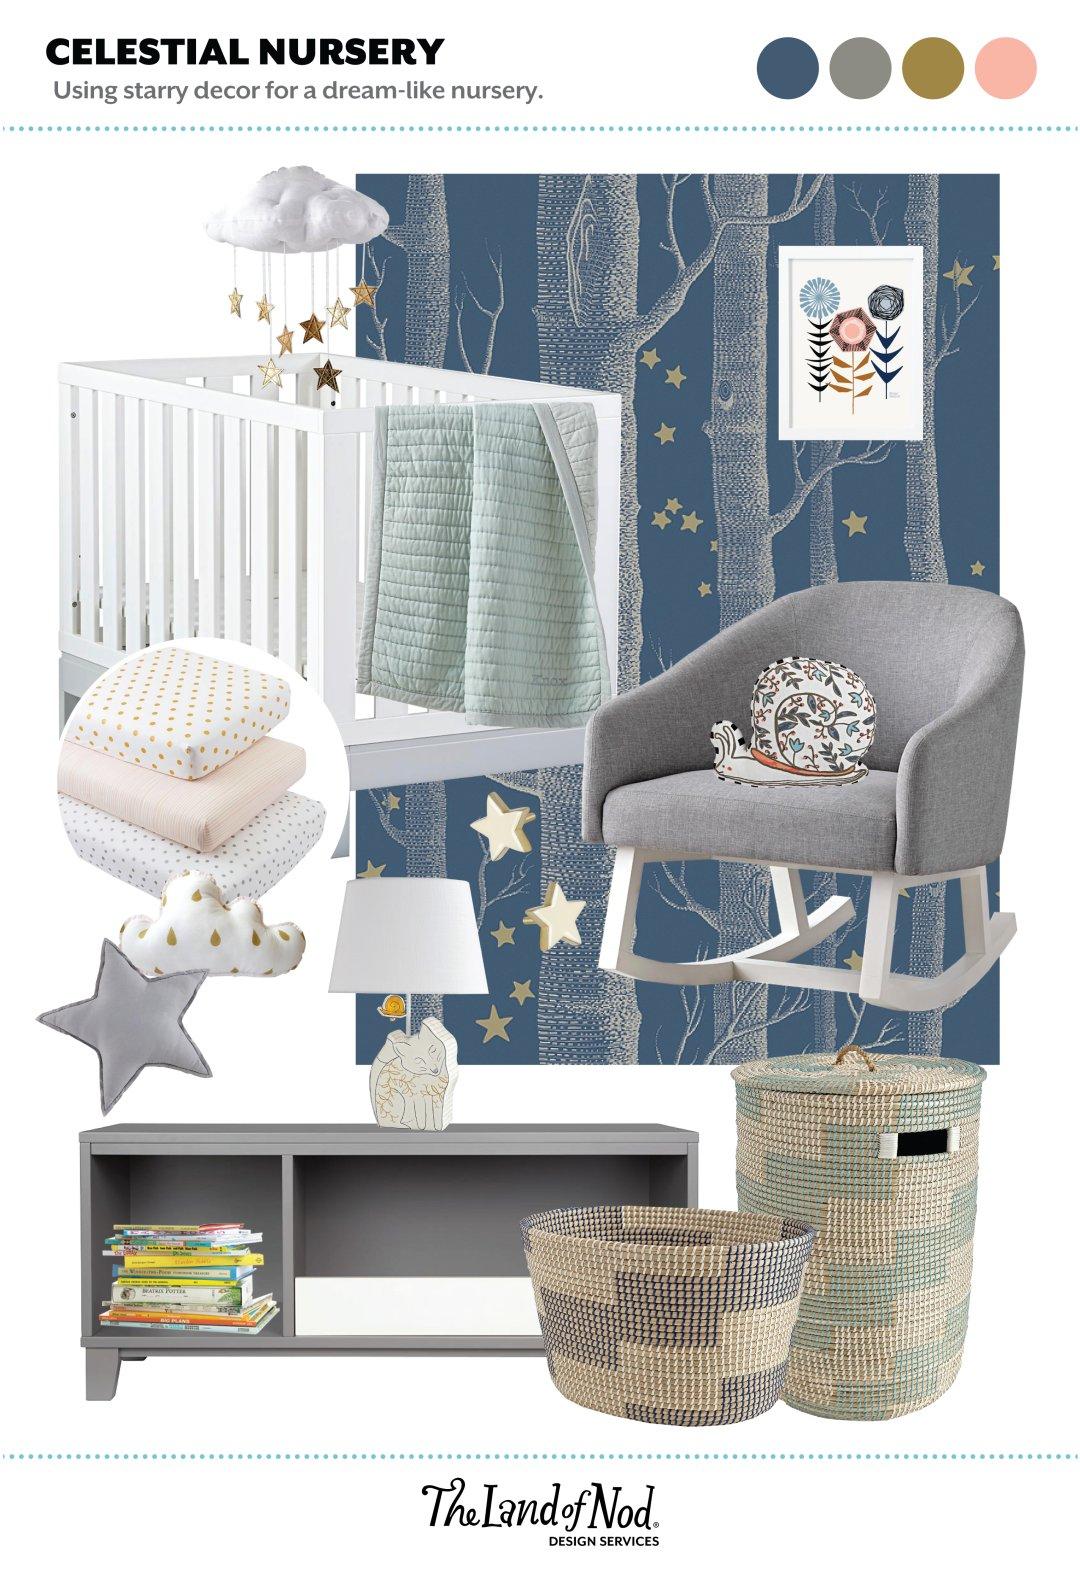 Celestial Nursery